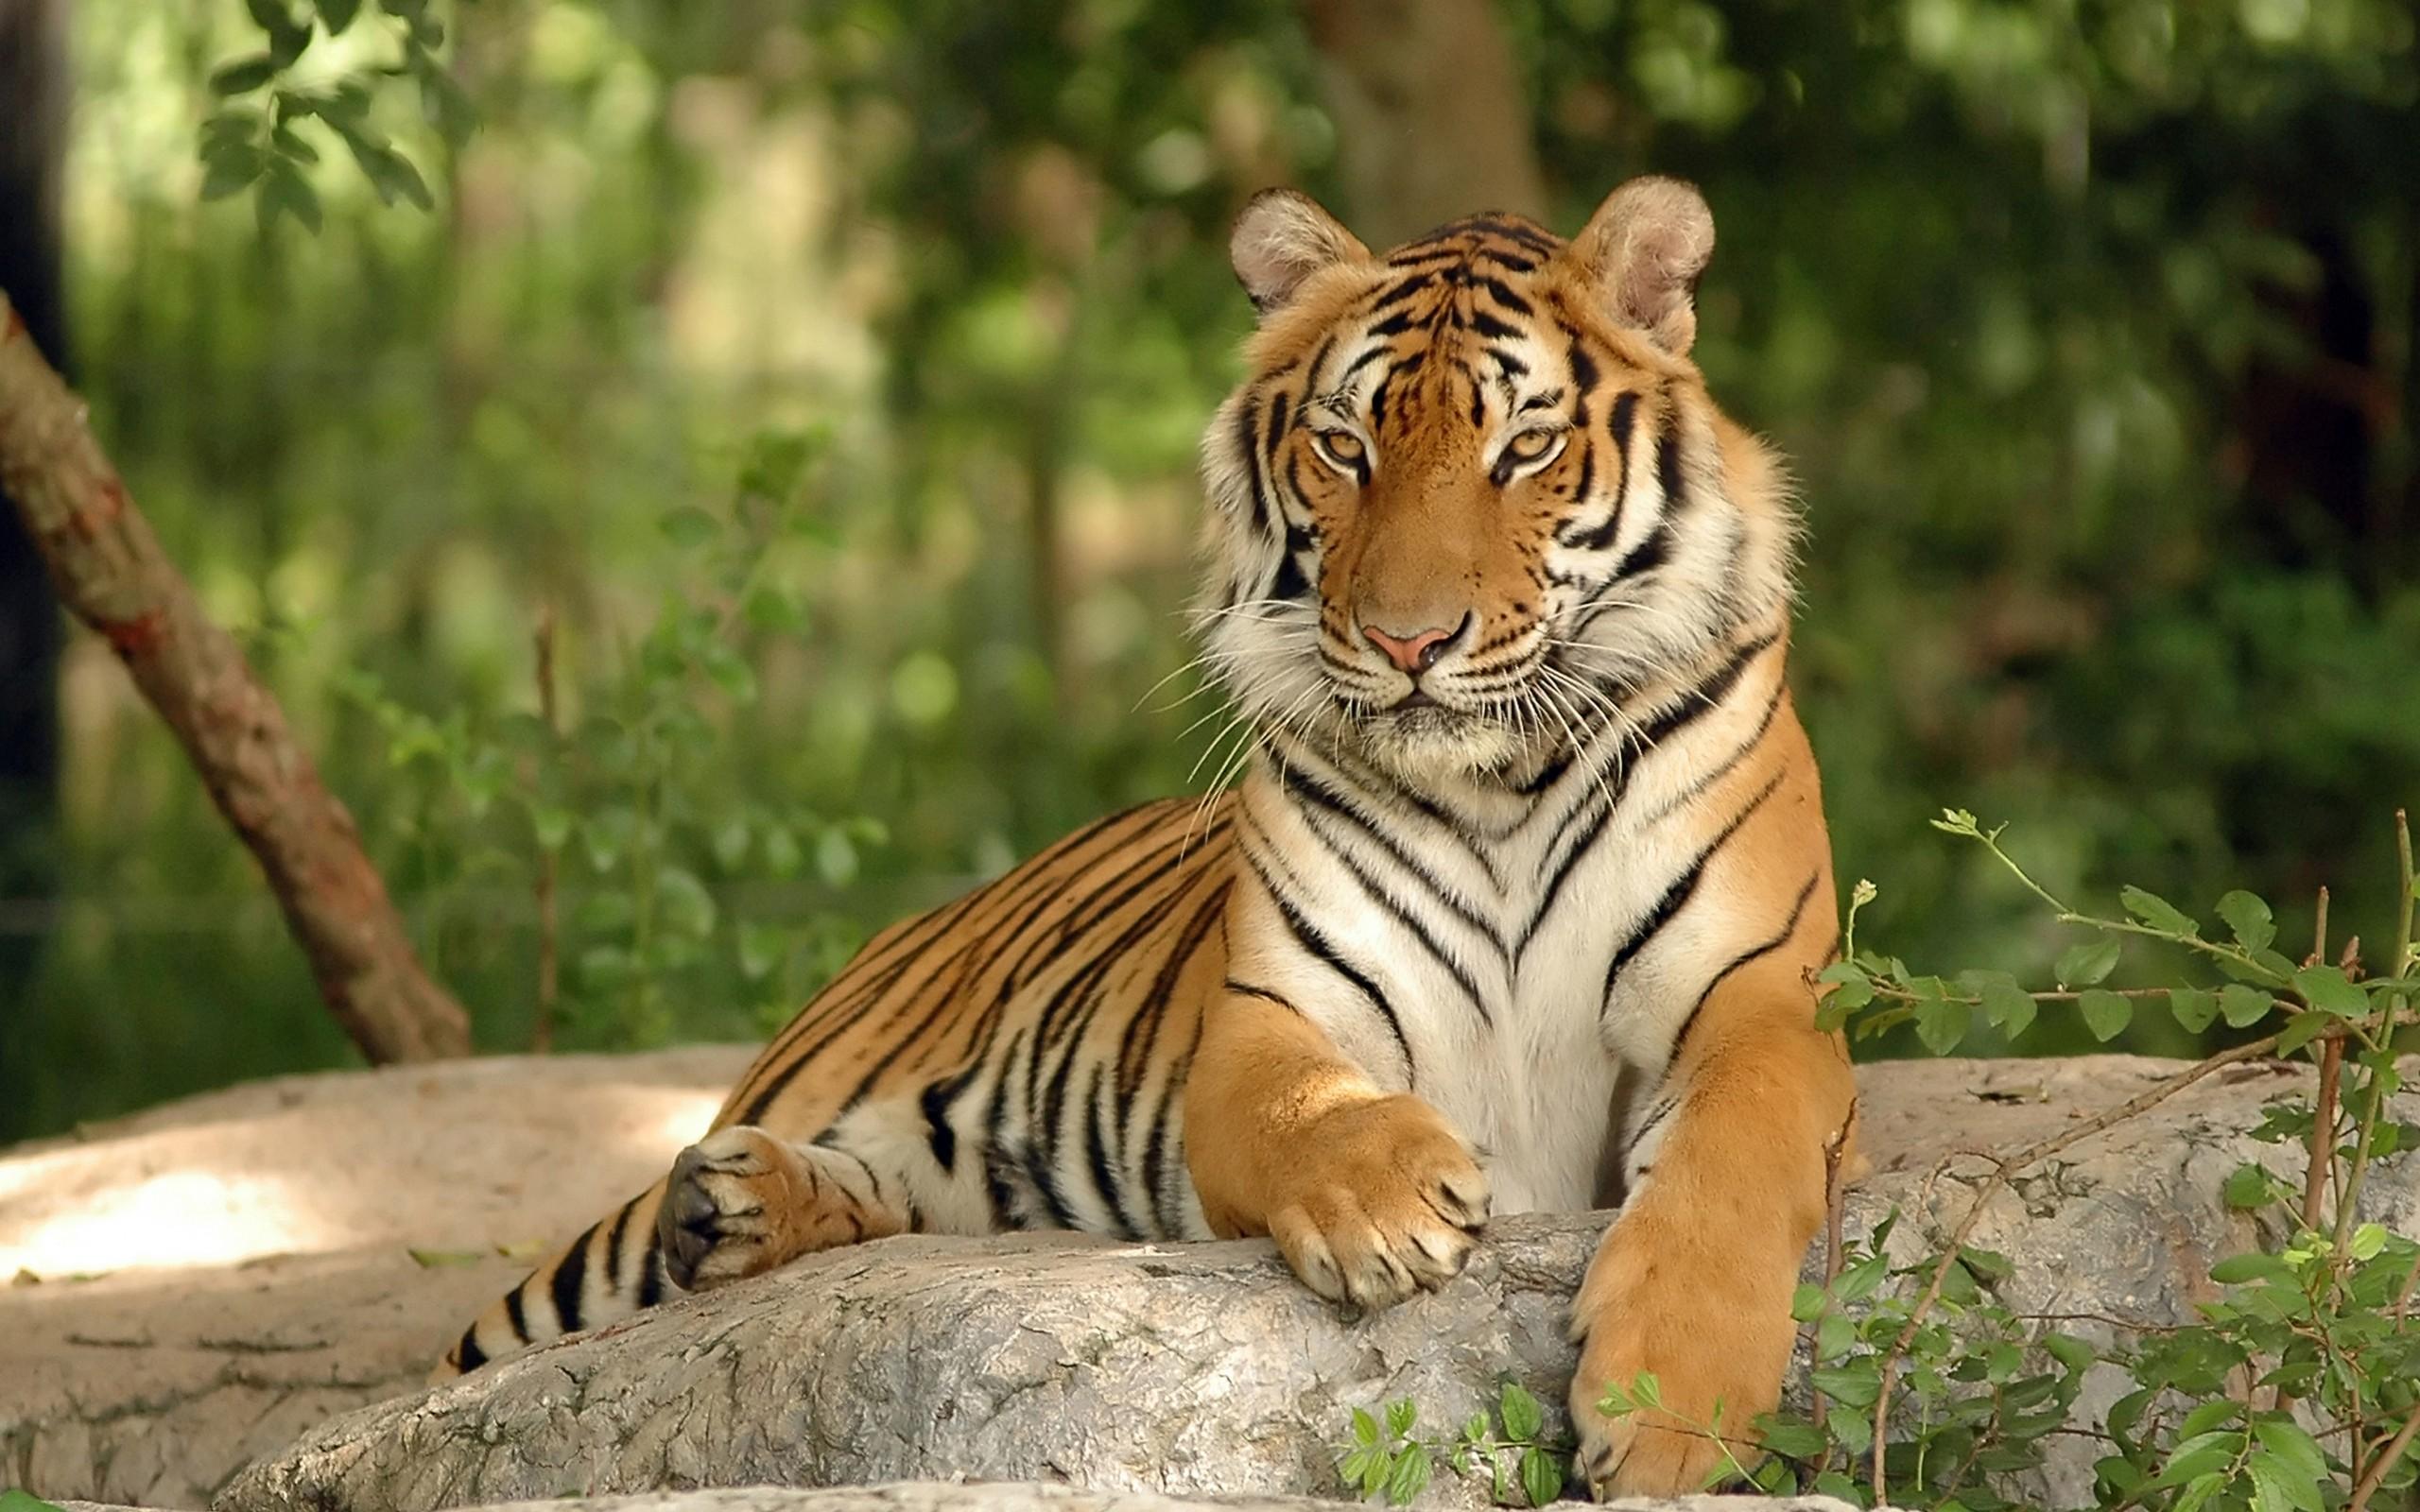 tiger hd wallpaper | background image | 2560x1600 | id:390413